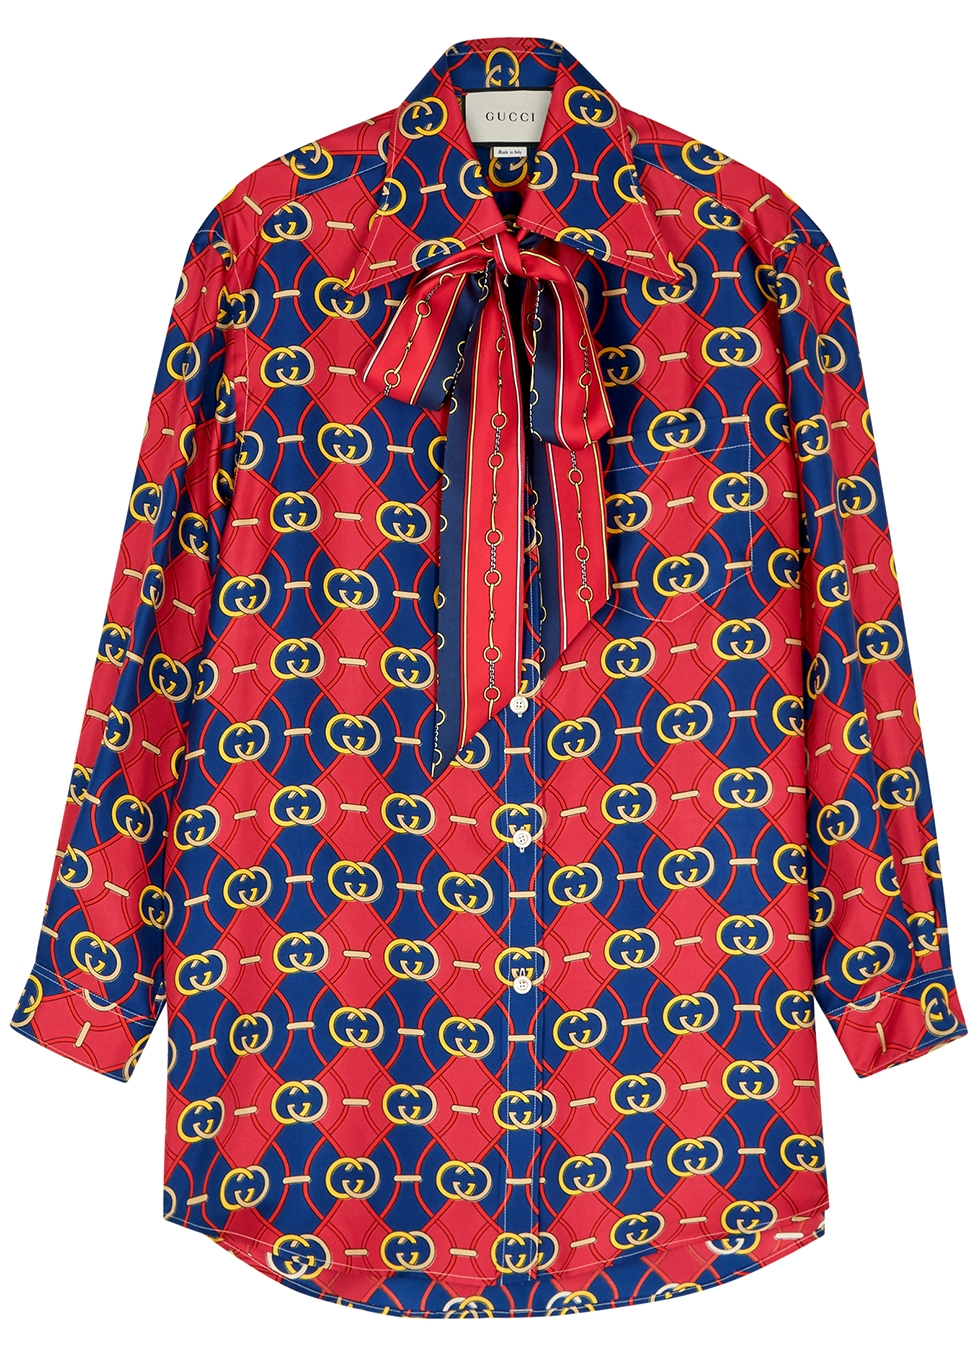 GG printed silk top - Gucci